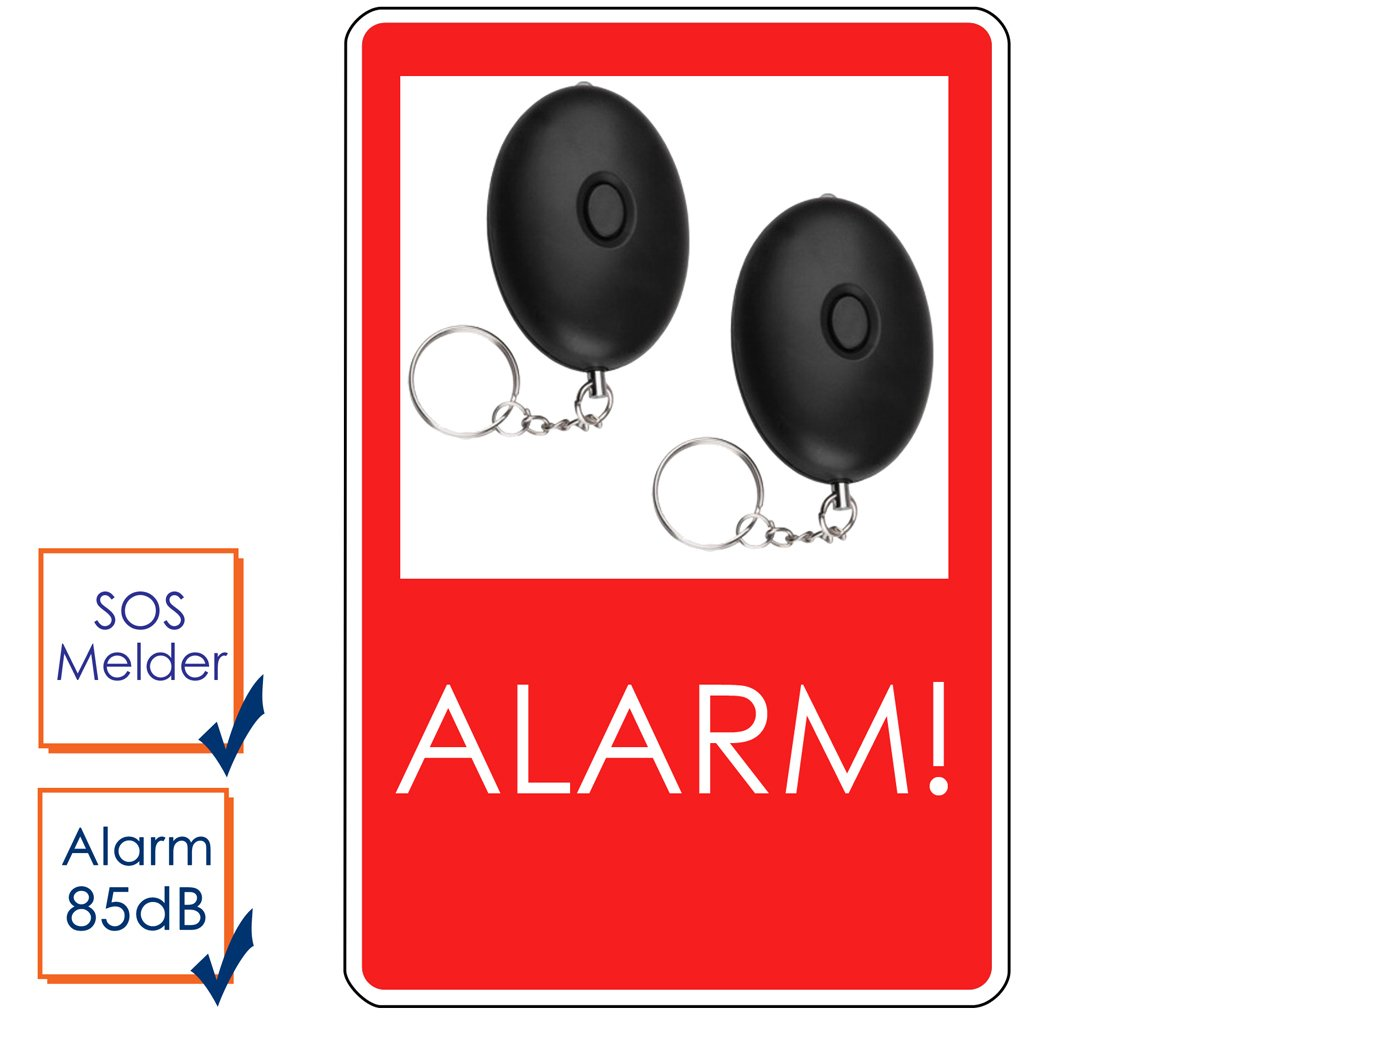 SMARTWARES 2er-Set Mini-Taschenalarm Überfallalarm SOS-Notruf Personen-Alarm 85dB, SC03SW